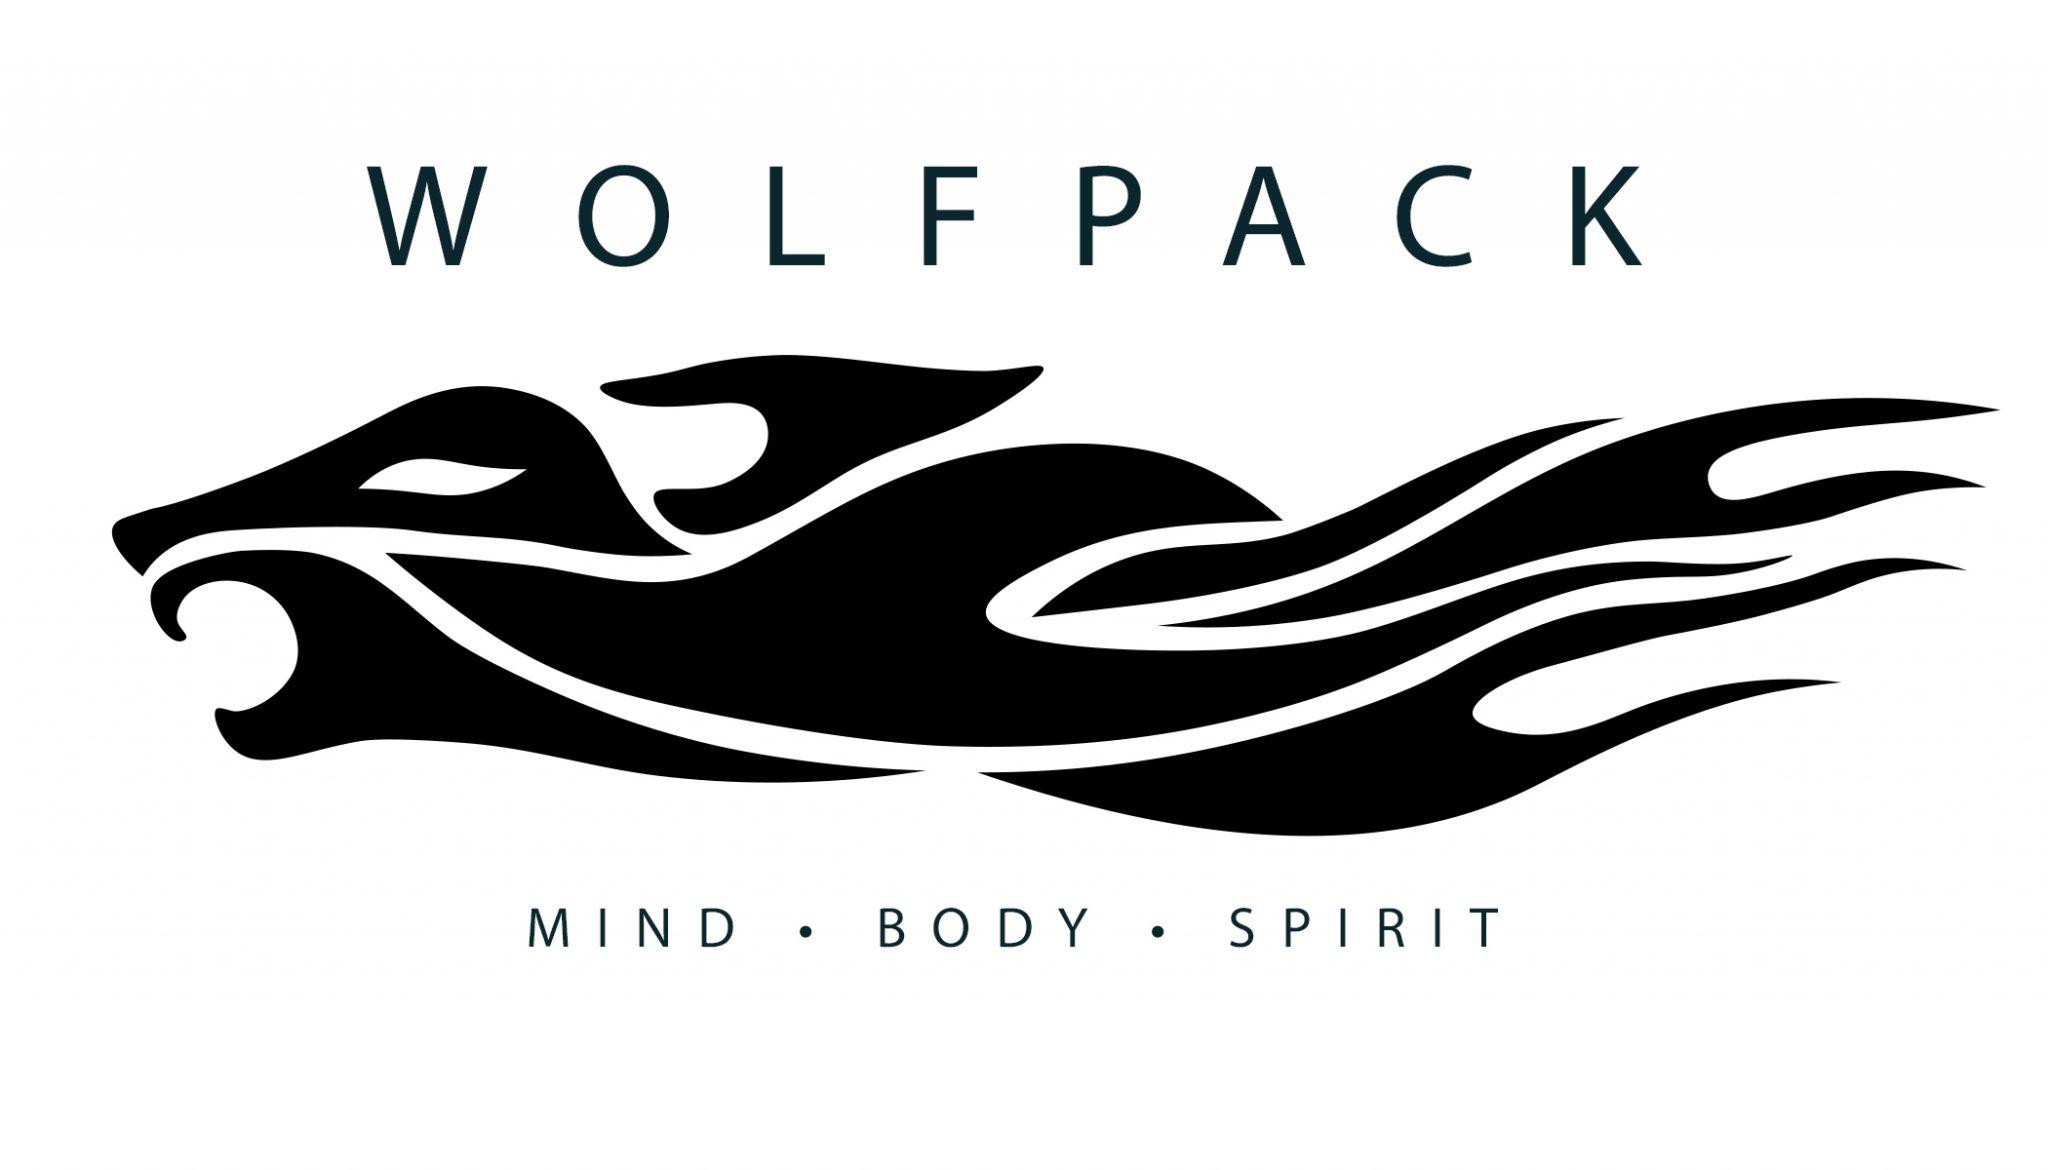 woldfpack logo